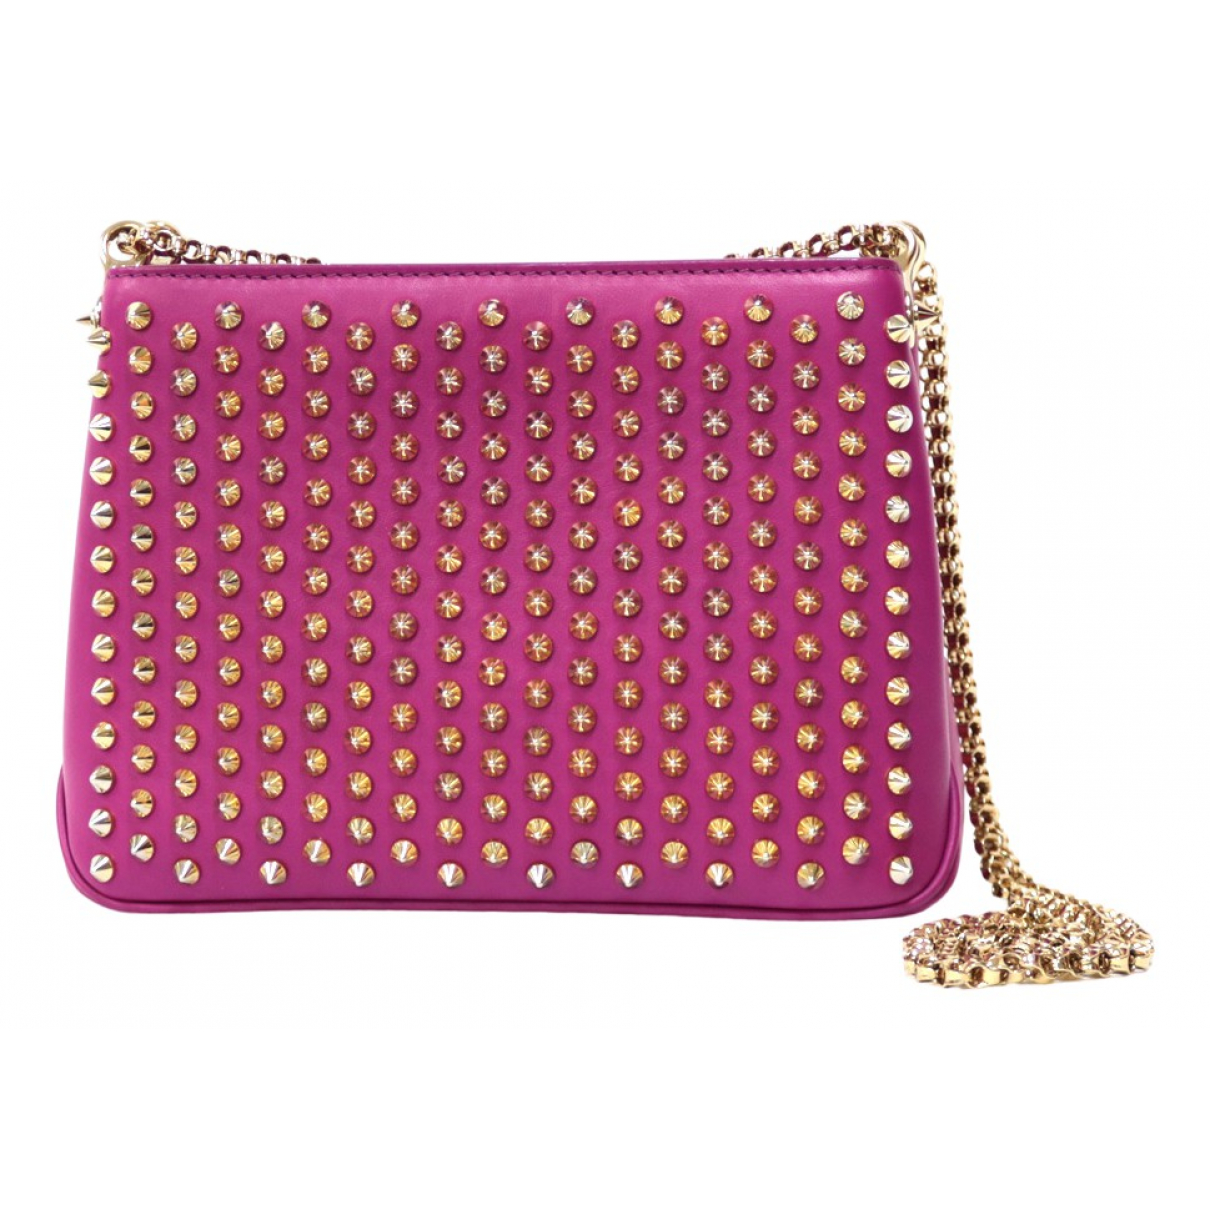 Christian Louboutin \N Pink Leather handbag for Women \N